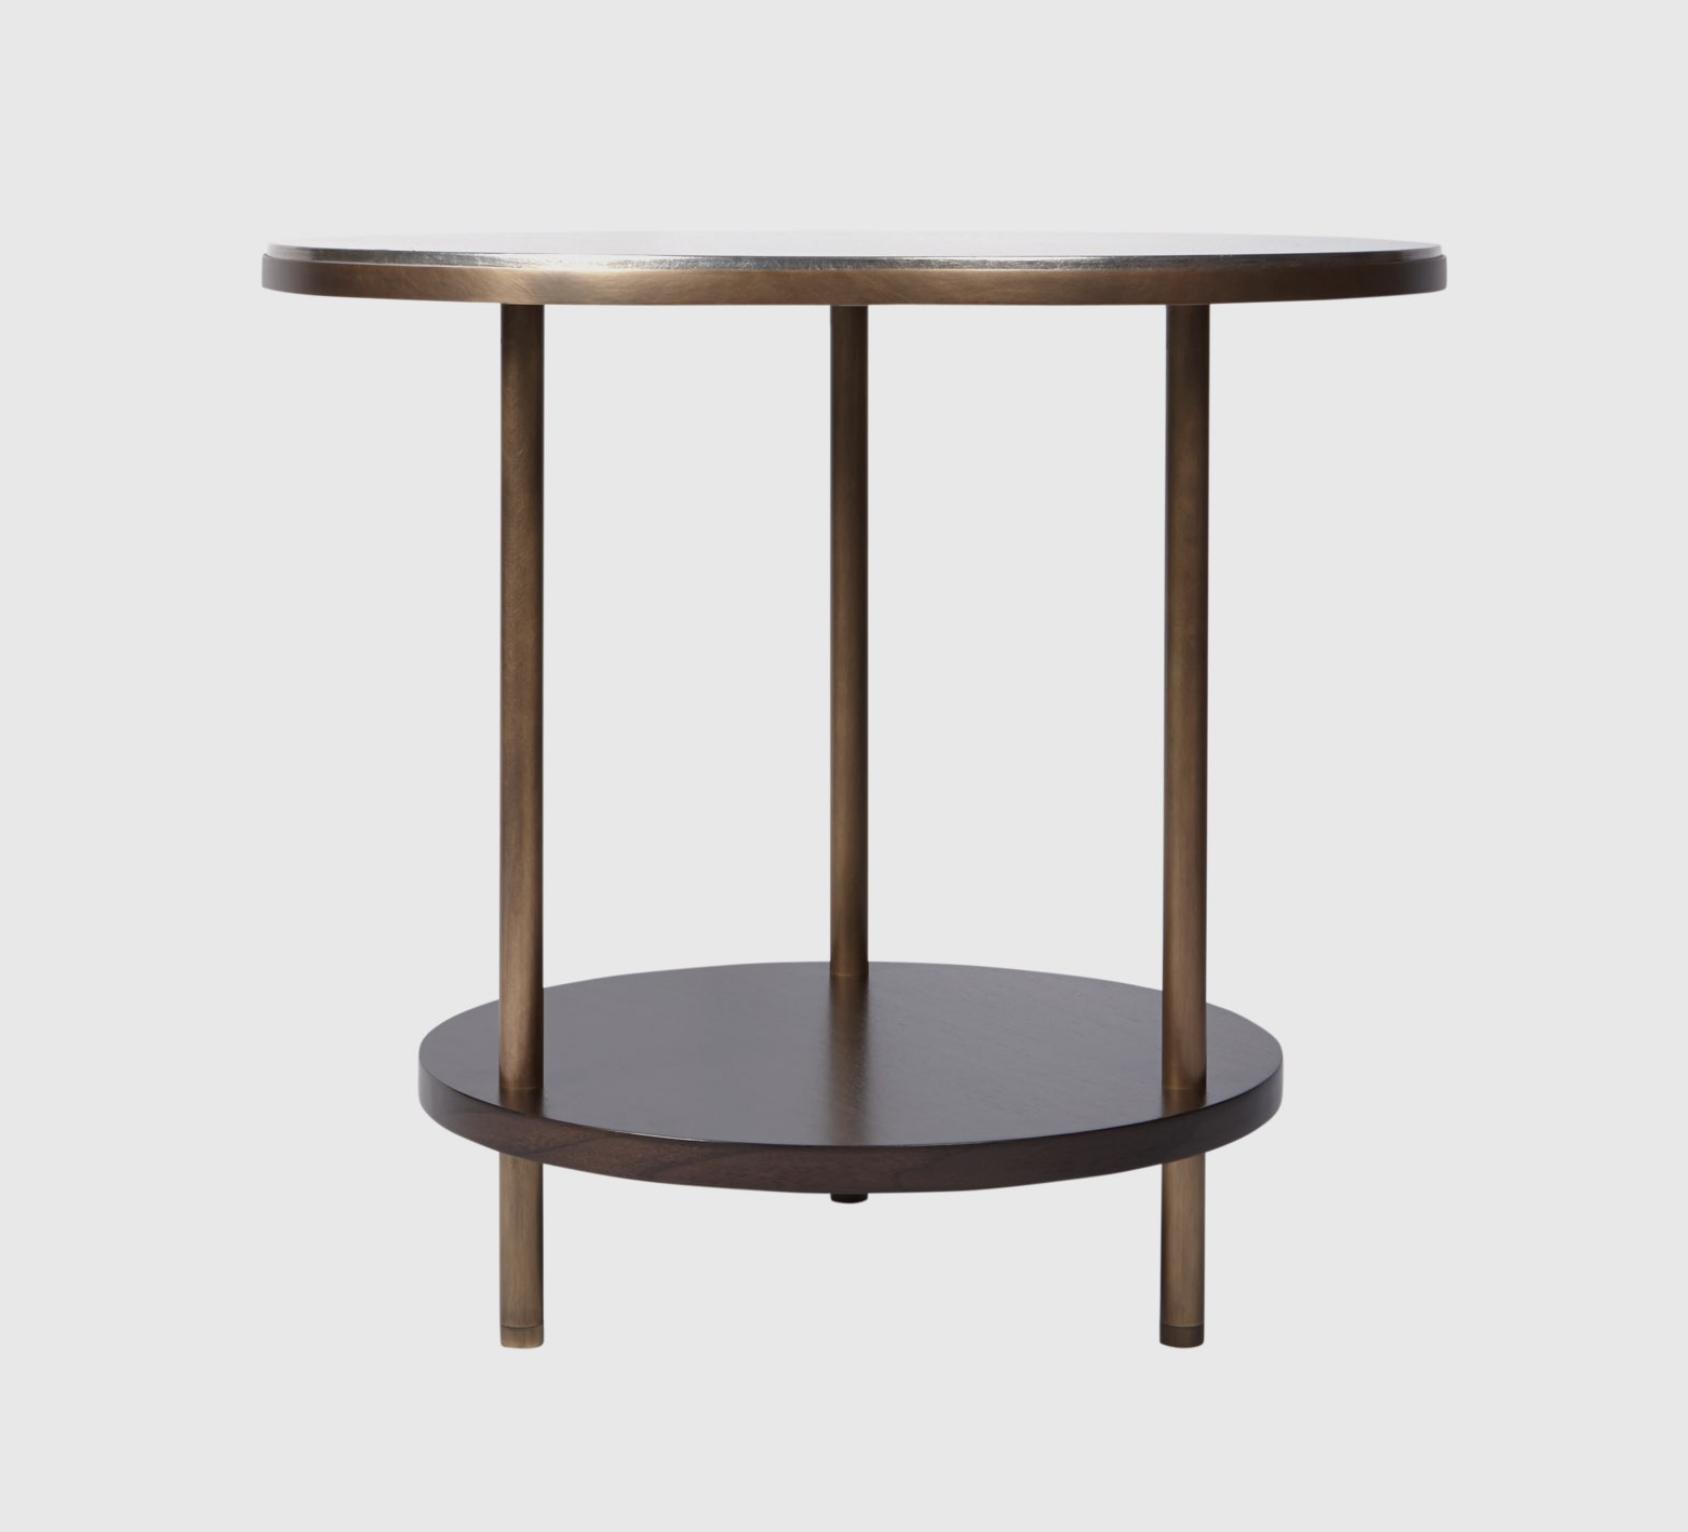 Aguirre Design - Round Osaka Side Table - Silver leaf, Walnut and brass